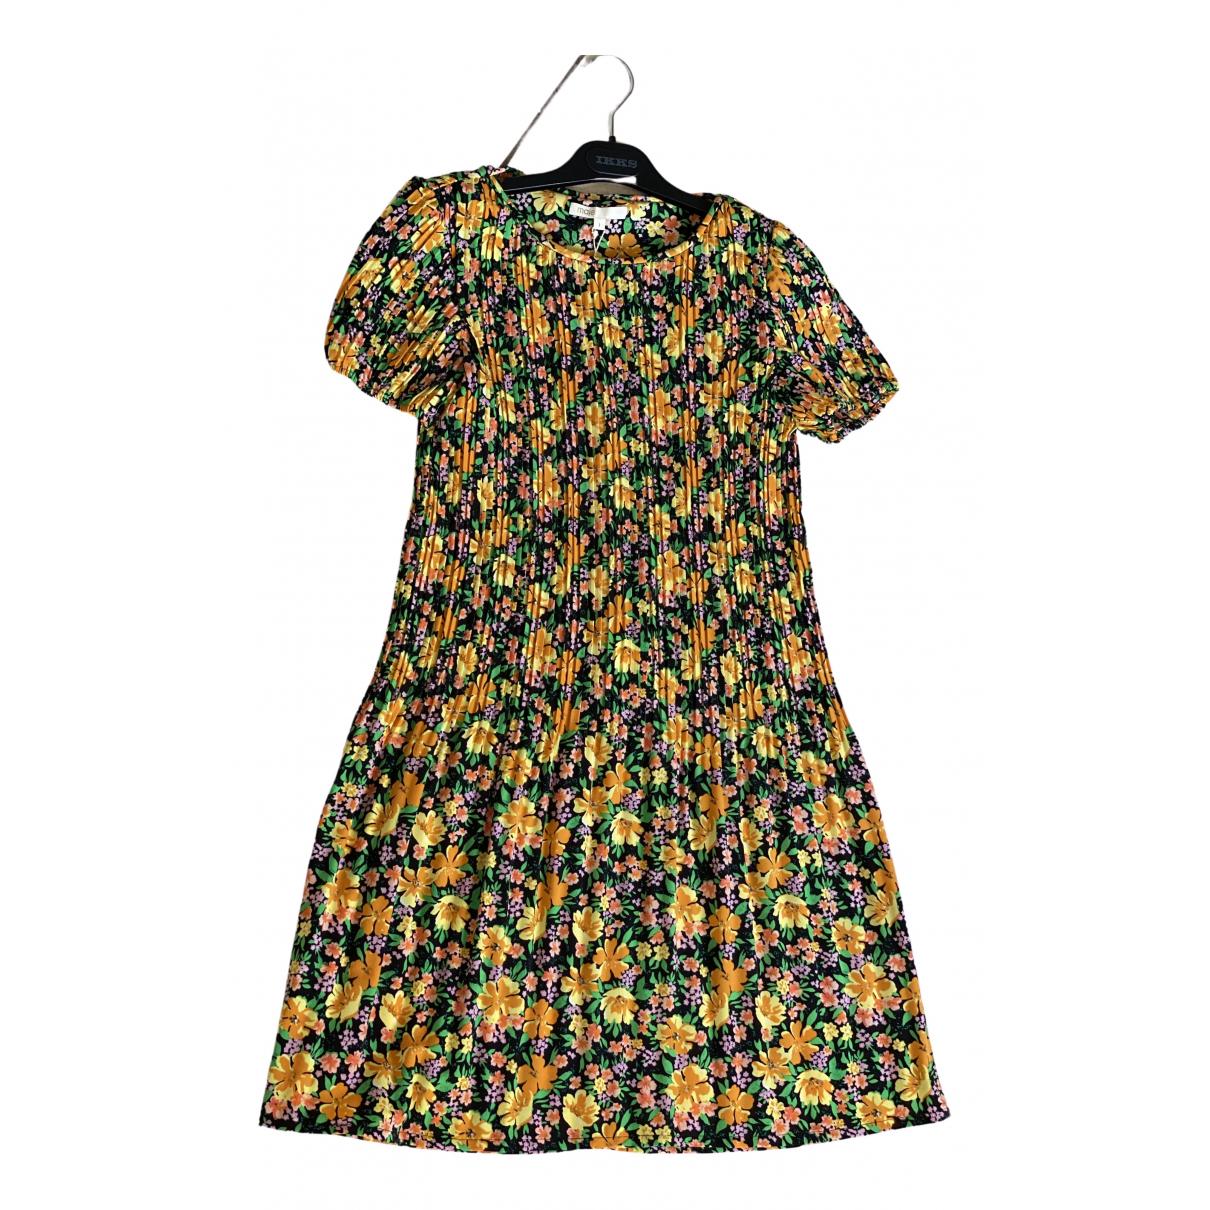 Maje Spring Summer 2019 Yellow dress for Women 36 FR